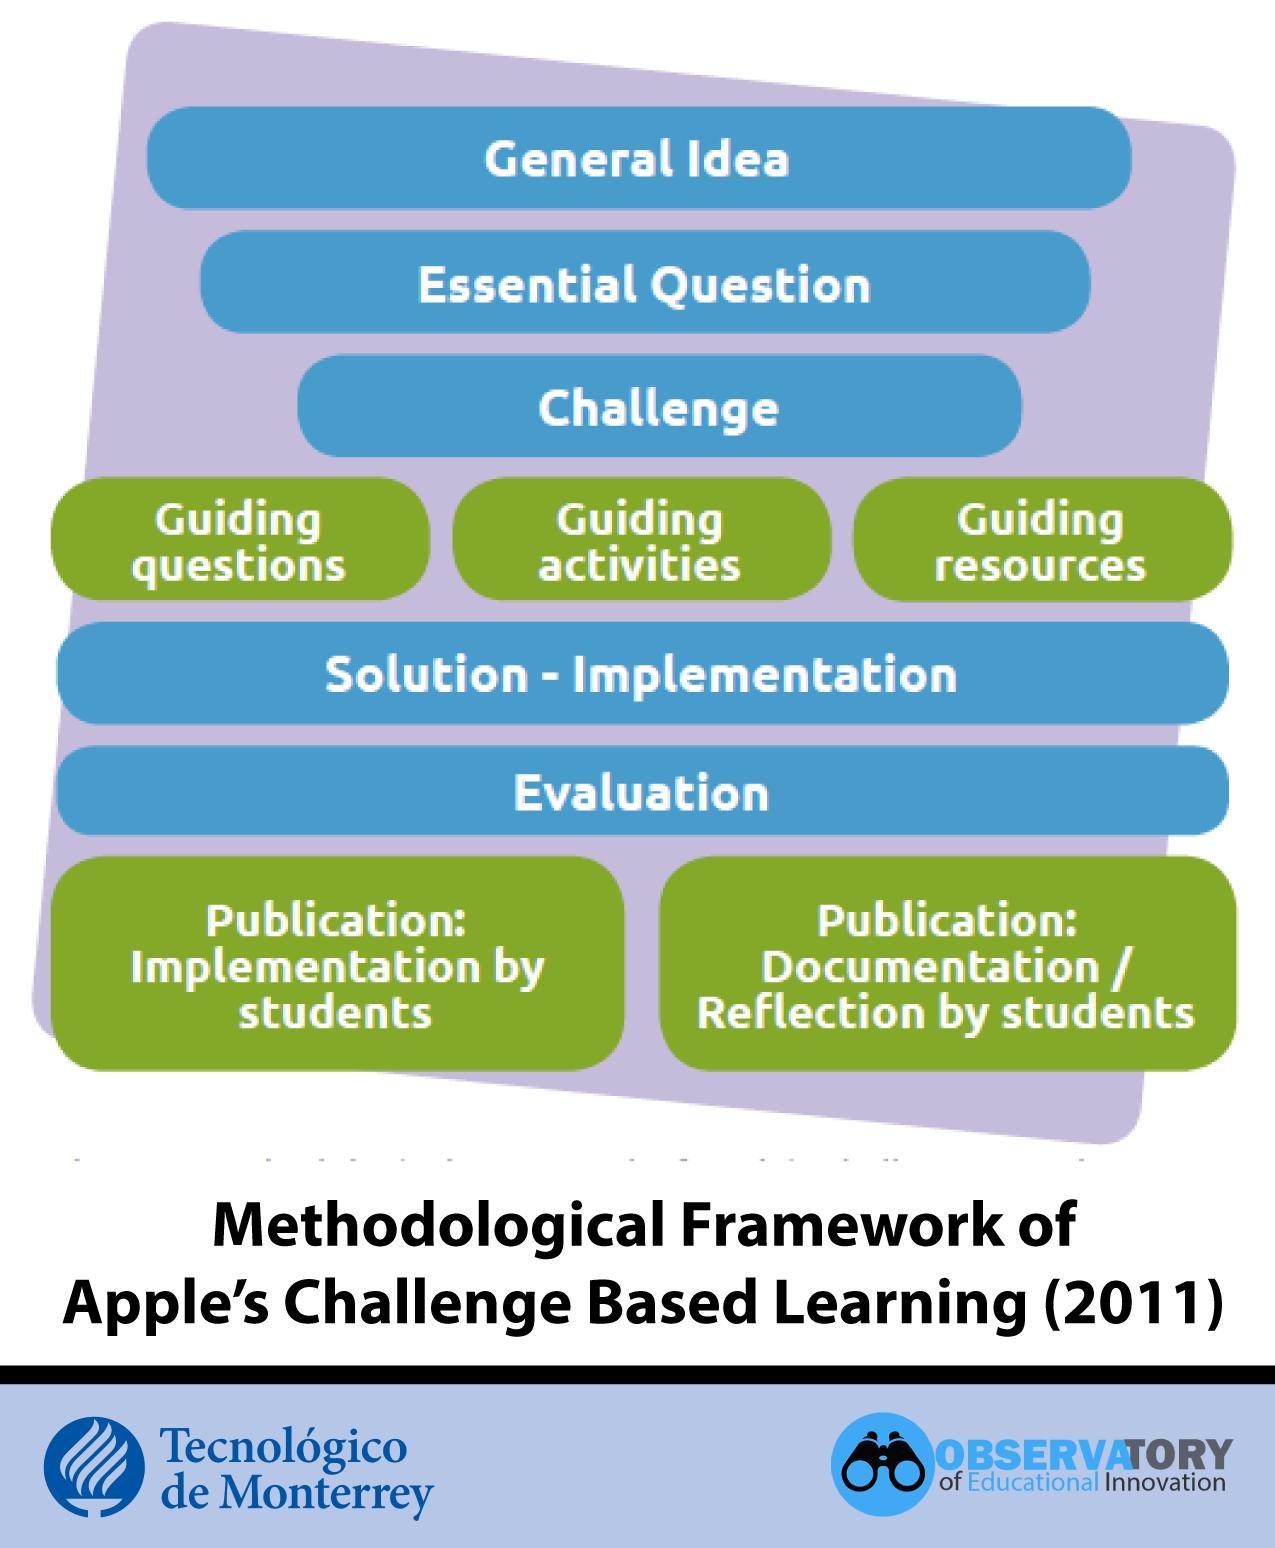 Apple's Challenge Based Learning